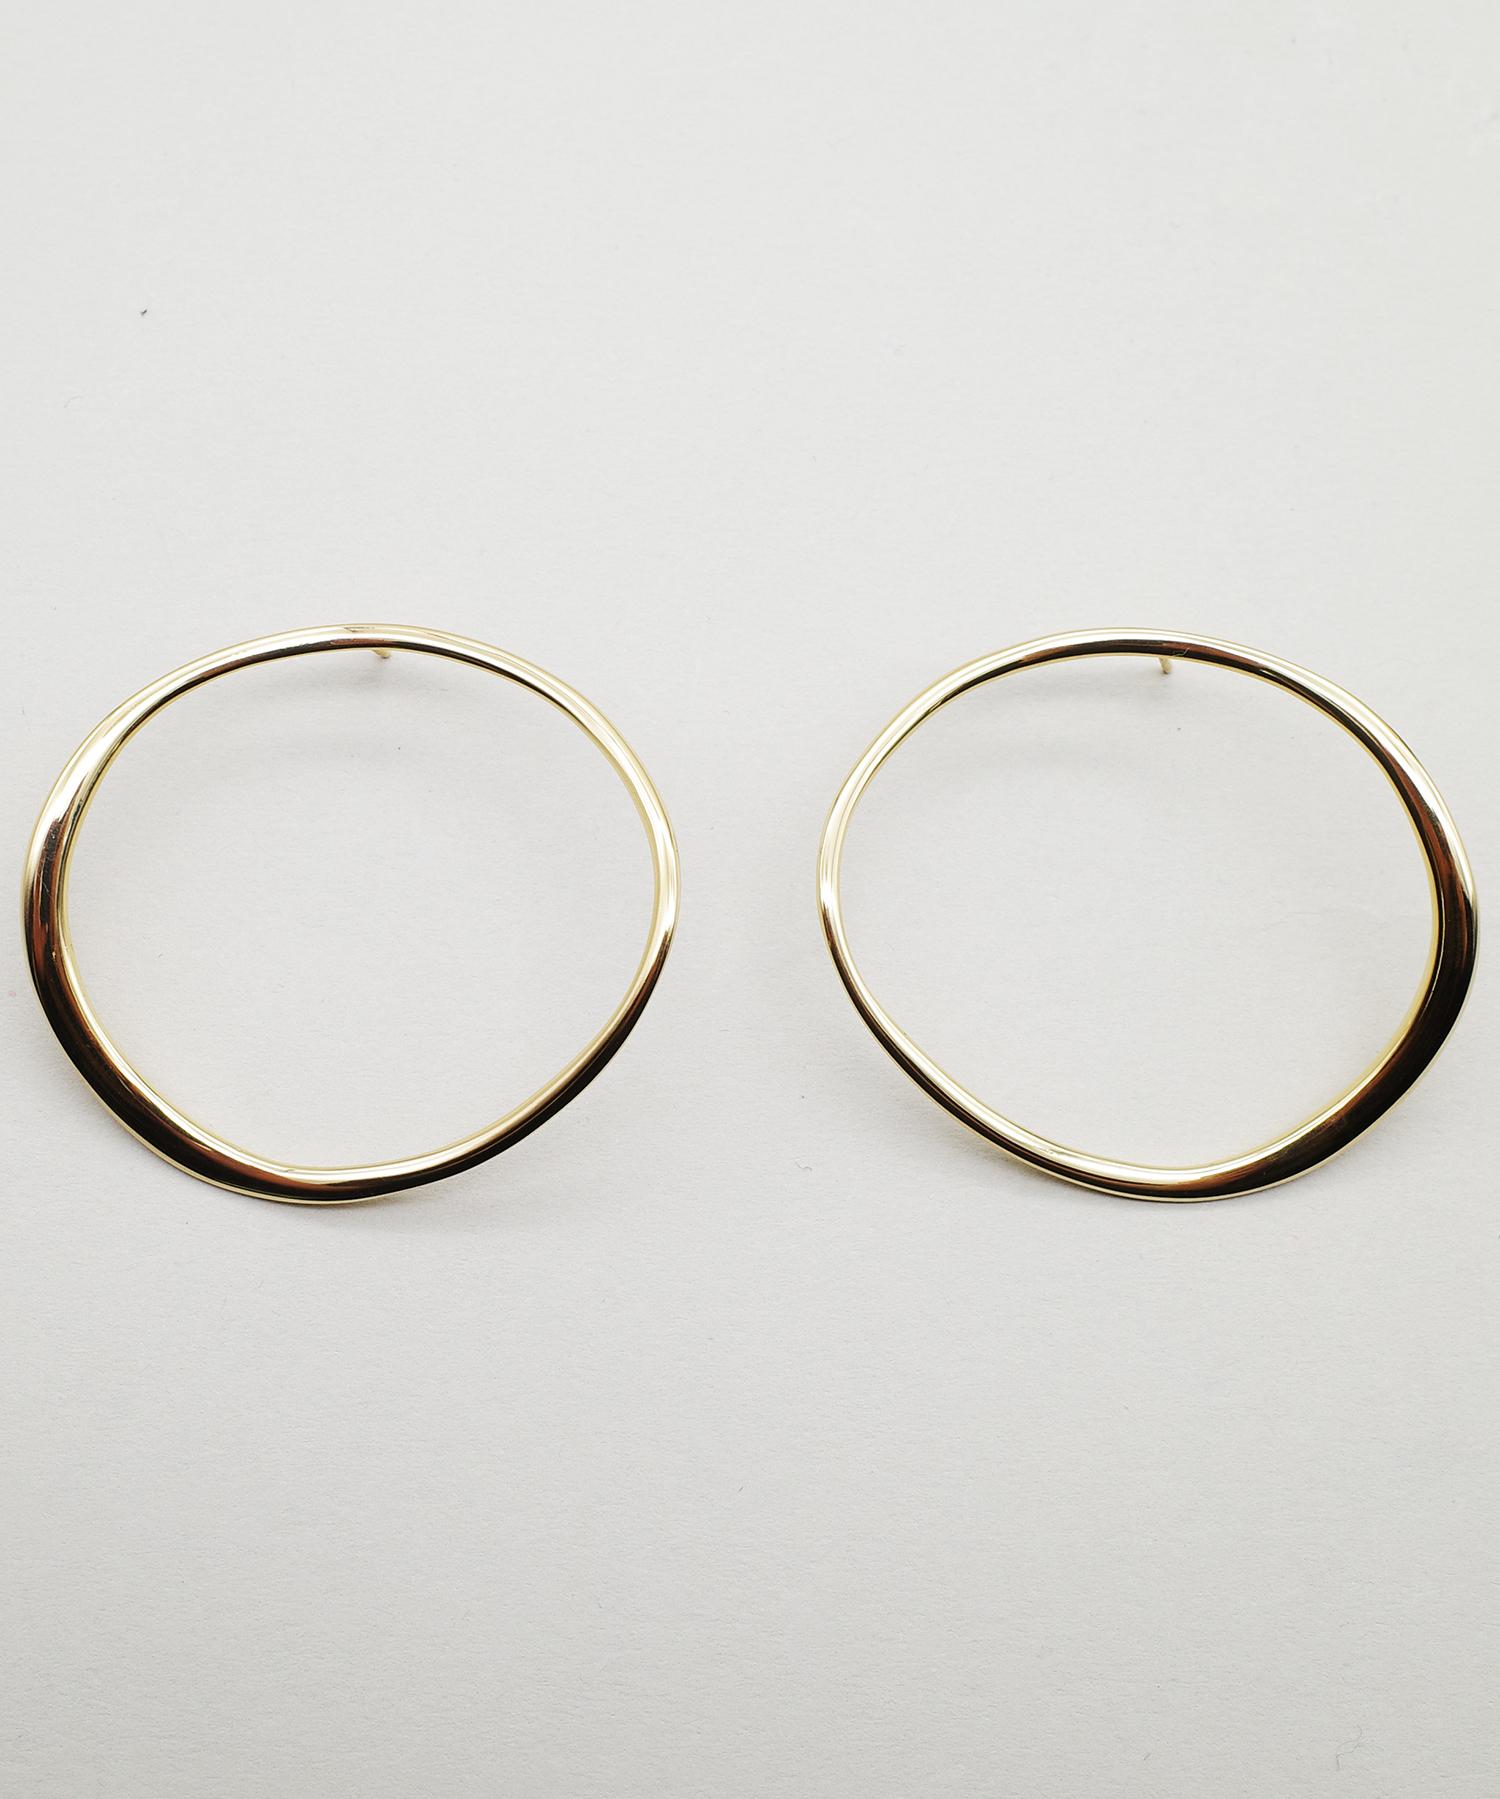 【blanc iris/ ブランイリス】Whirlpool collection Vermeil Pierce / ピアス